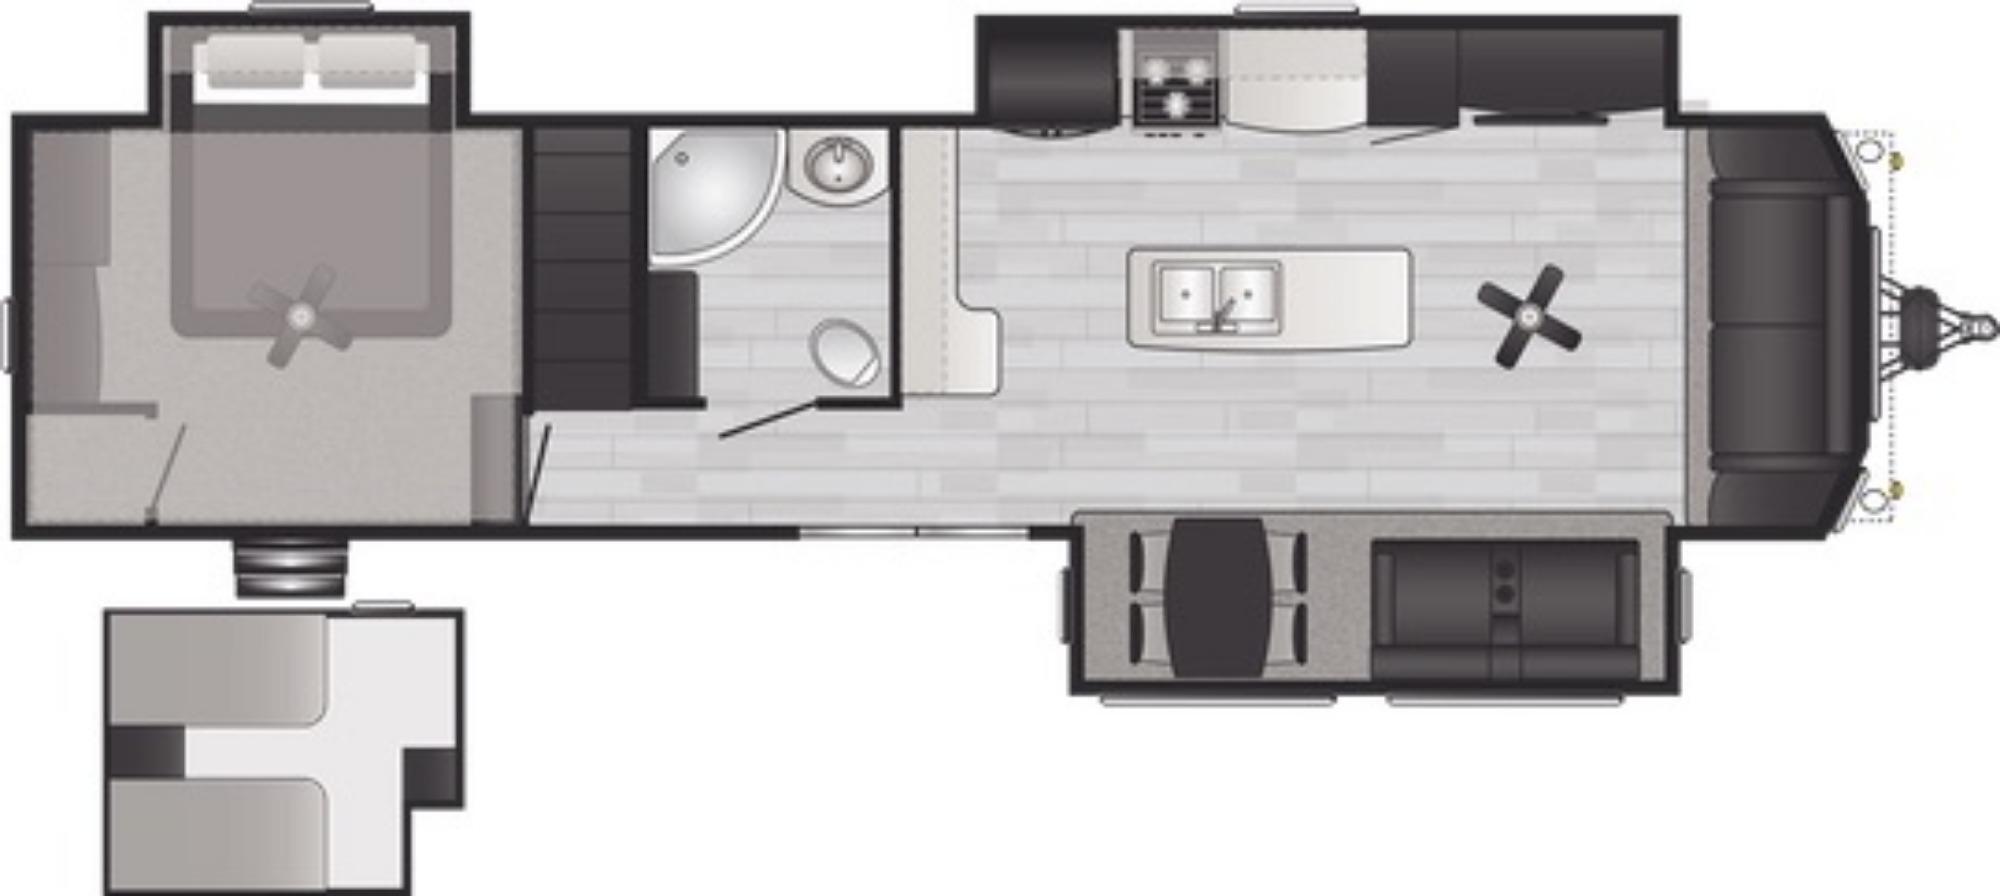 View Floor Plan for 2021 KEYSTONE RETREAT 39LOFT